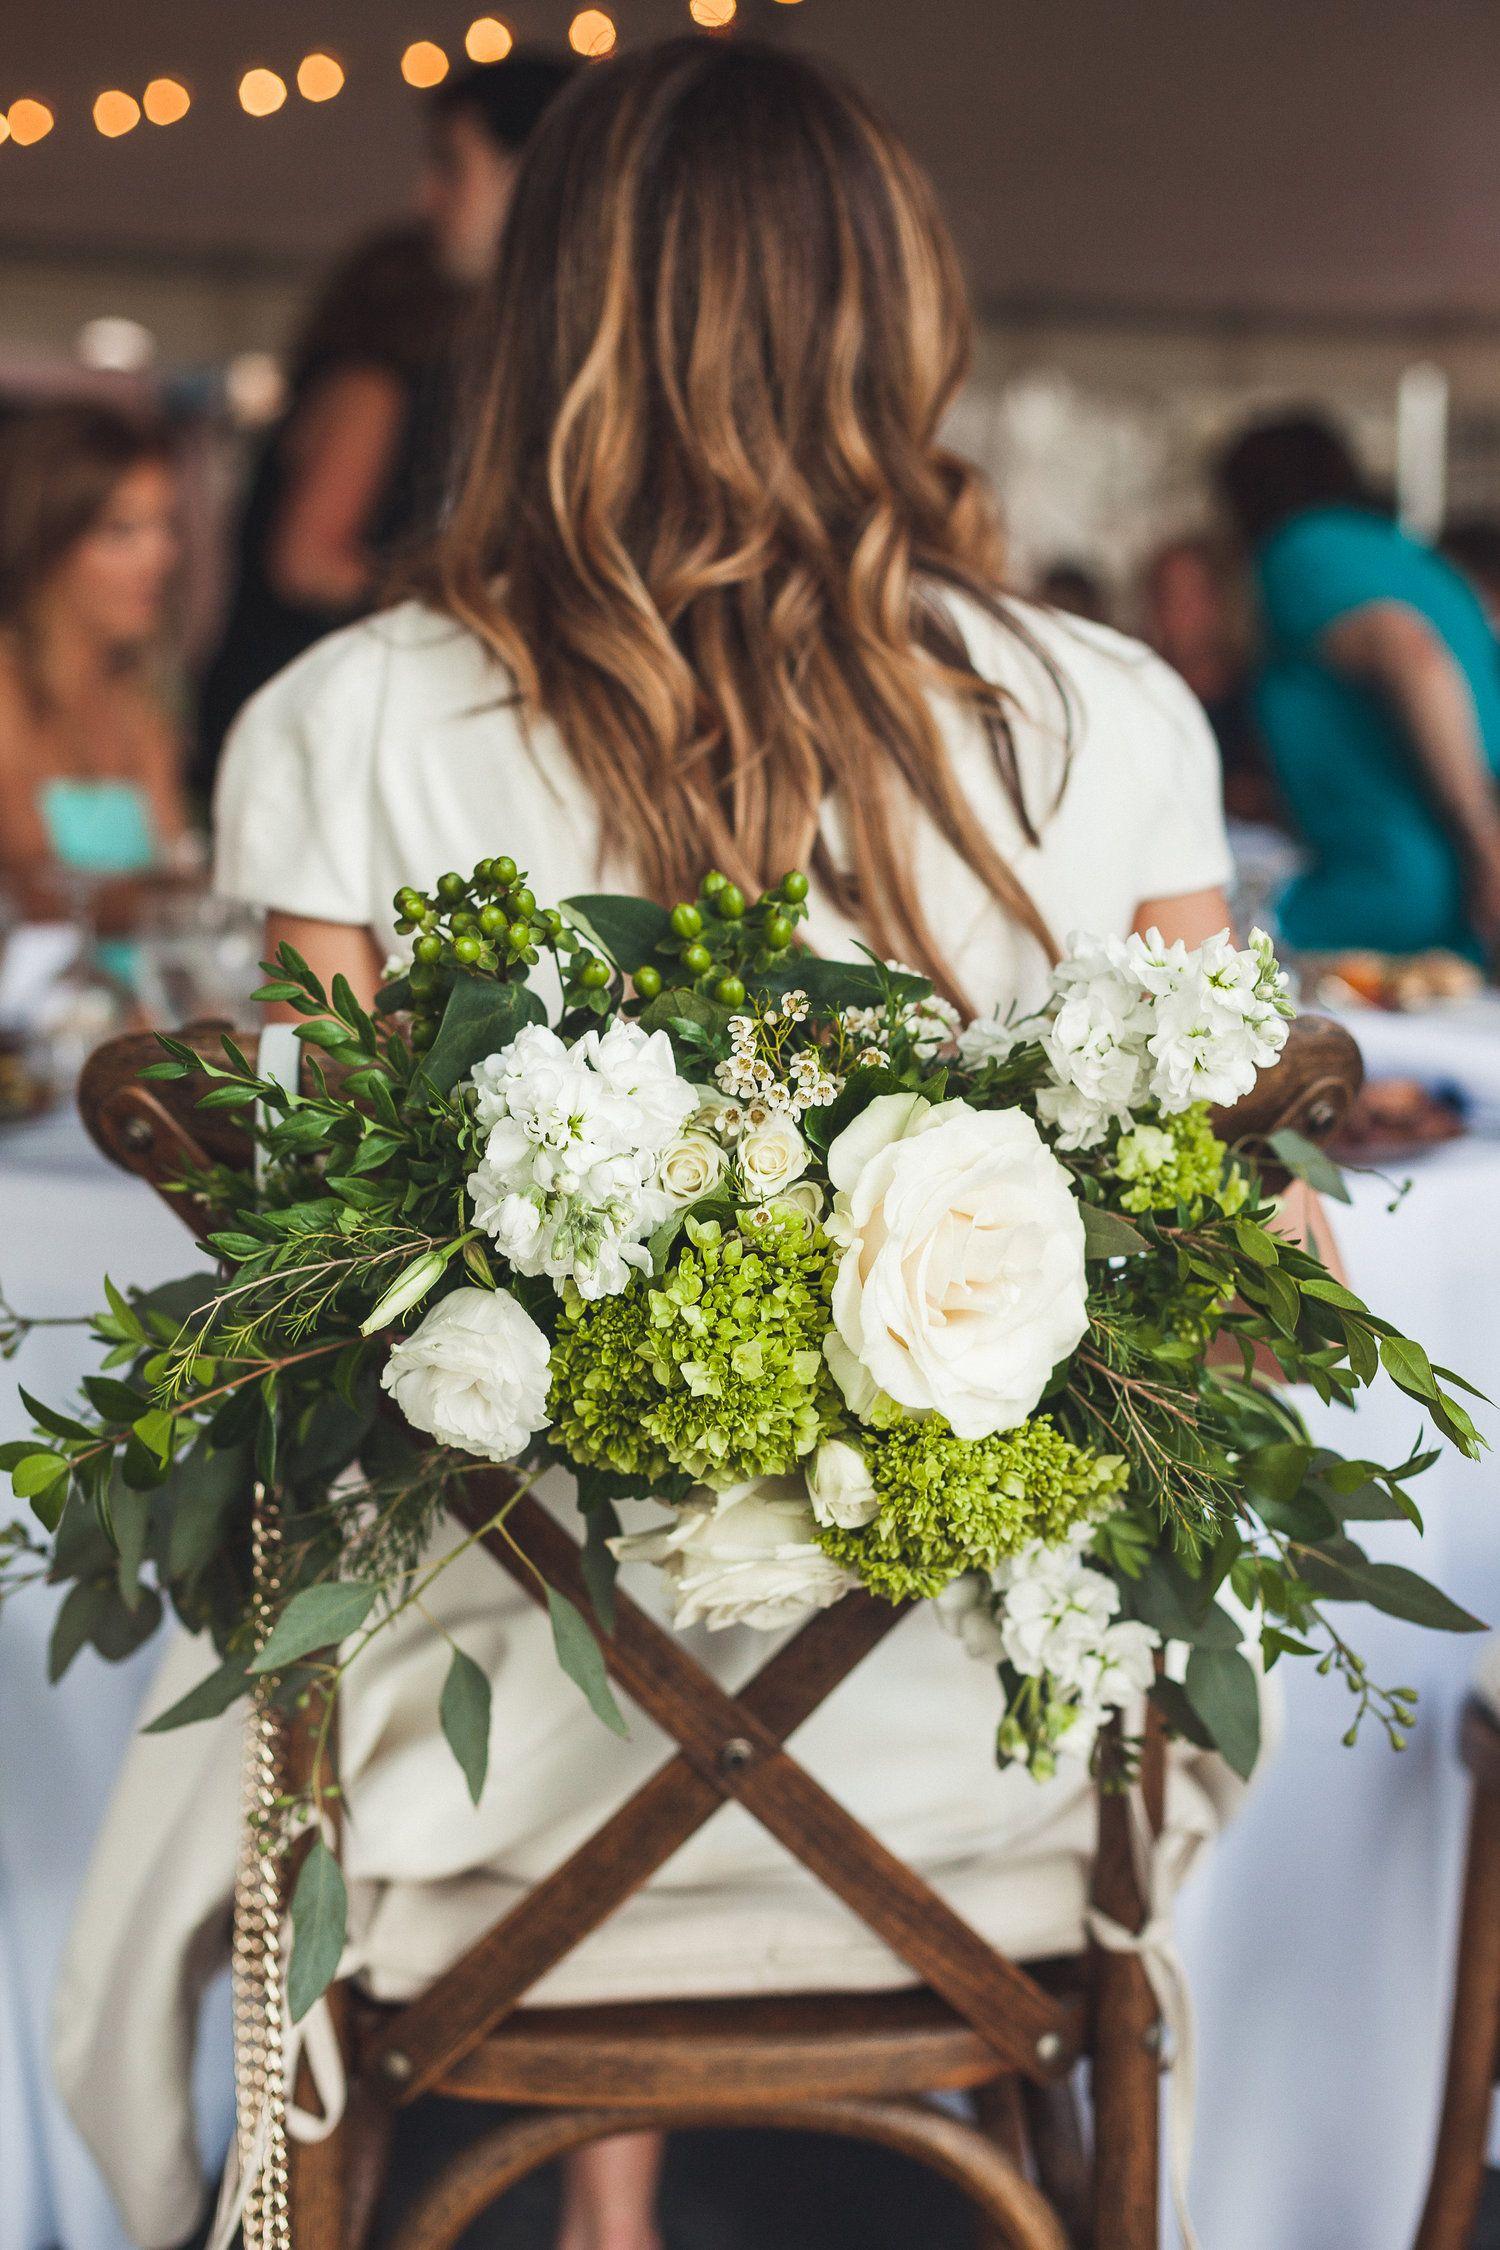 Green Hydrangea Green And White Wedding Flowers Blush Flowers Bouquet